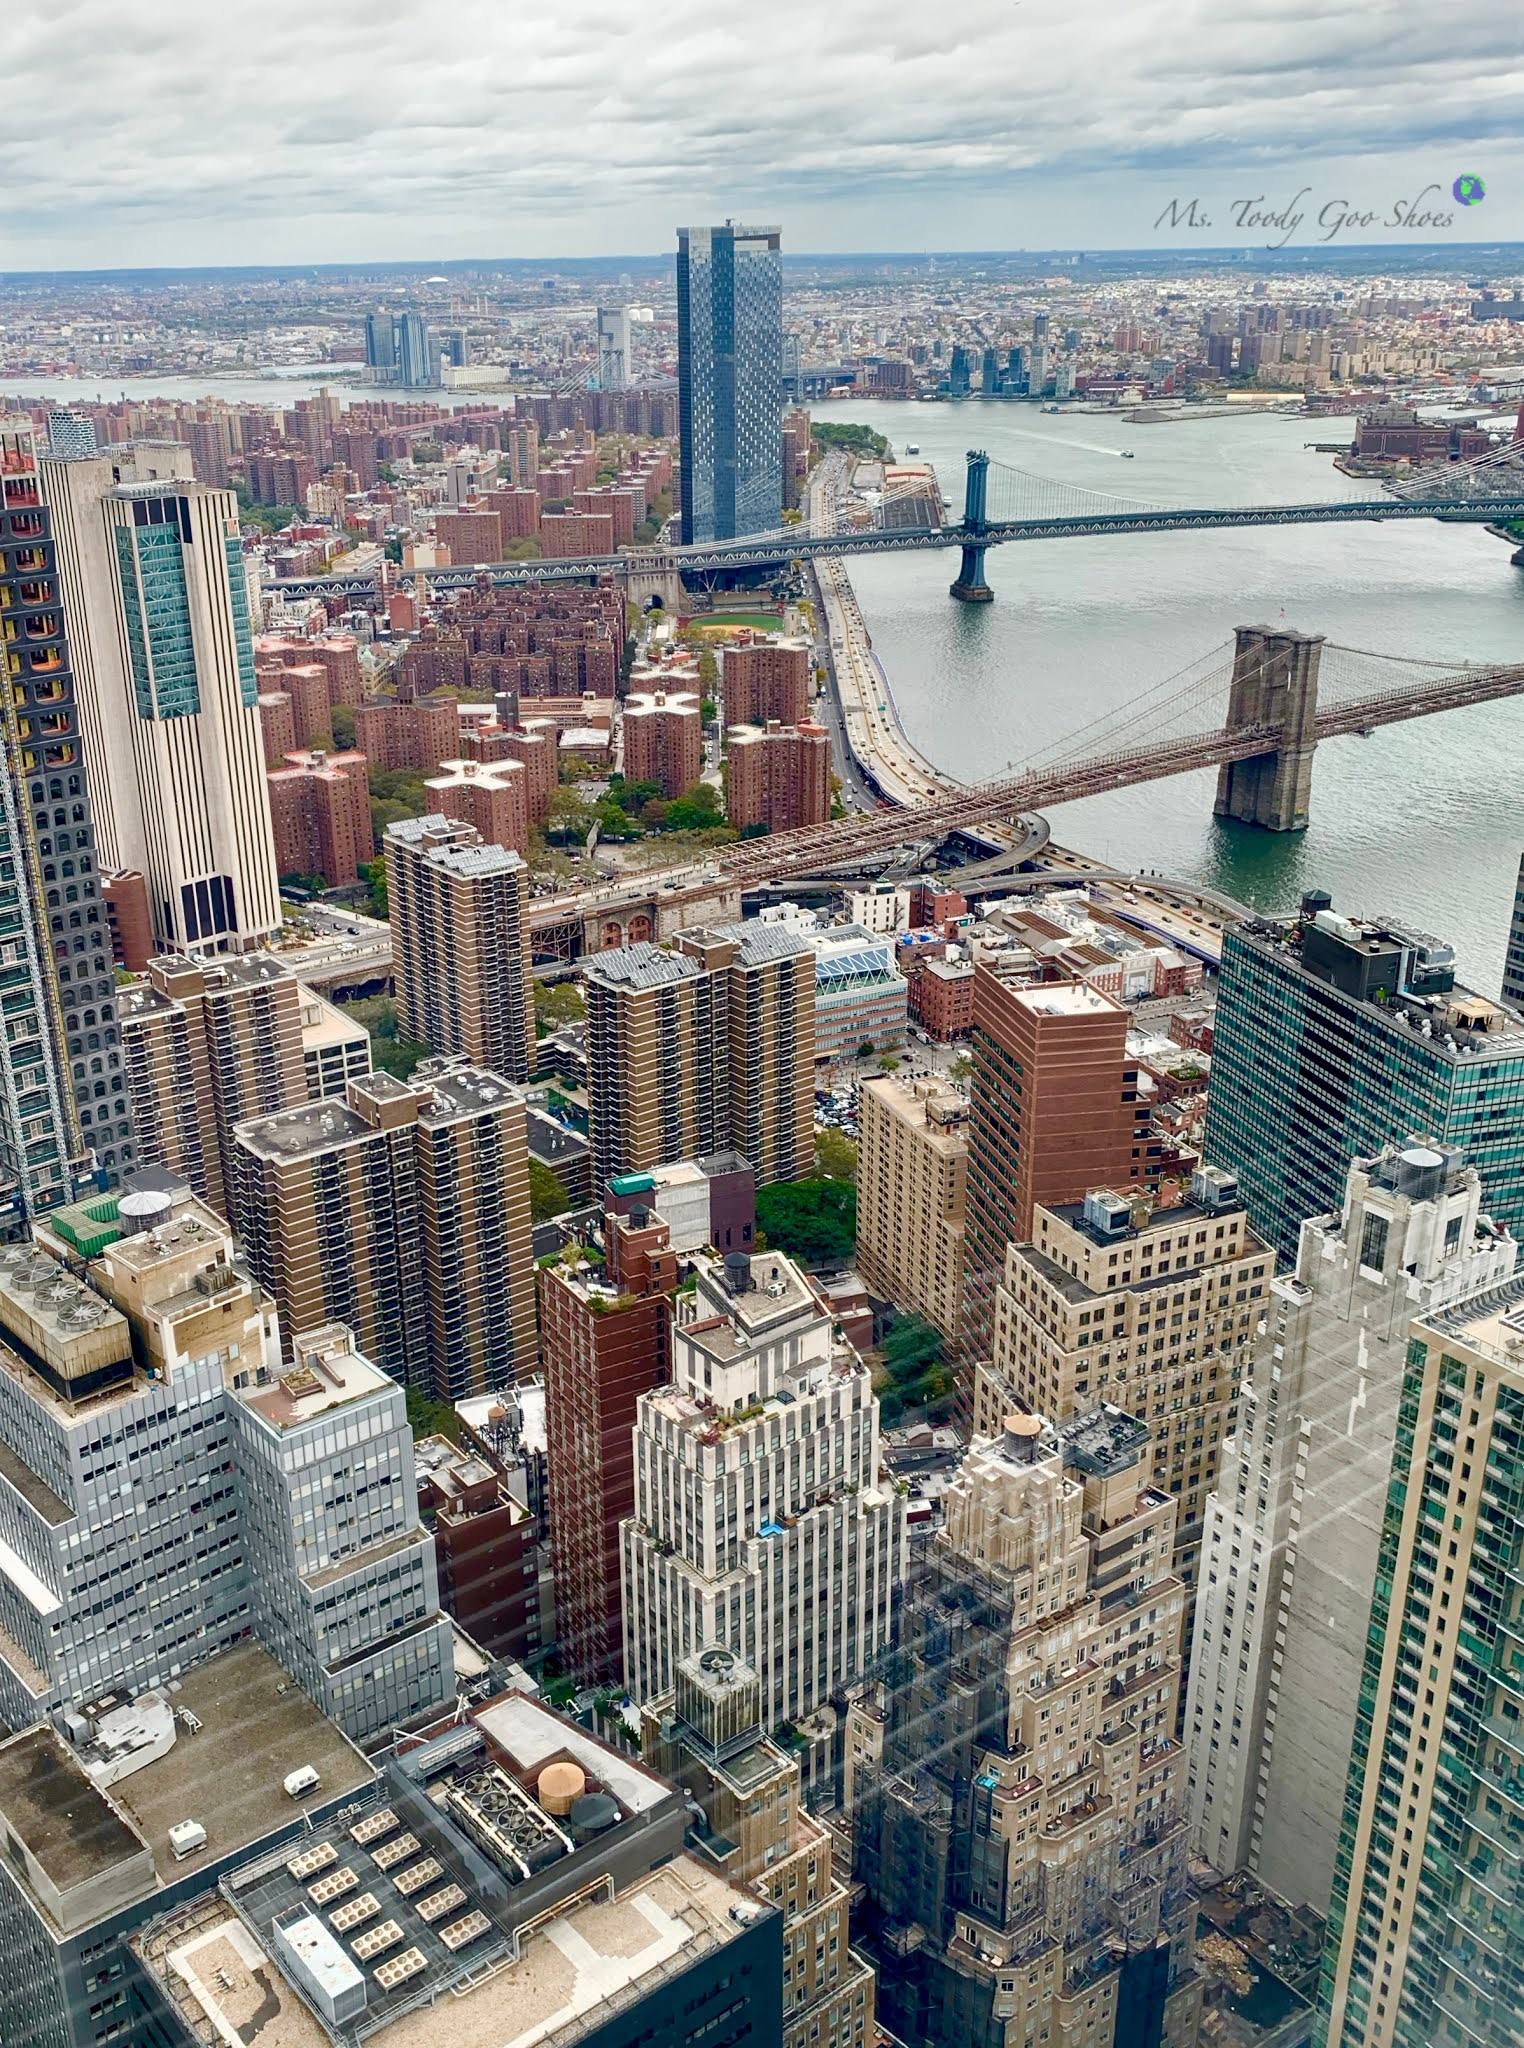 Skyline Views From Manhatta Restaurant New York City- Ms. Toody Goo Shoes